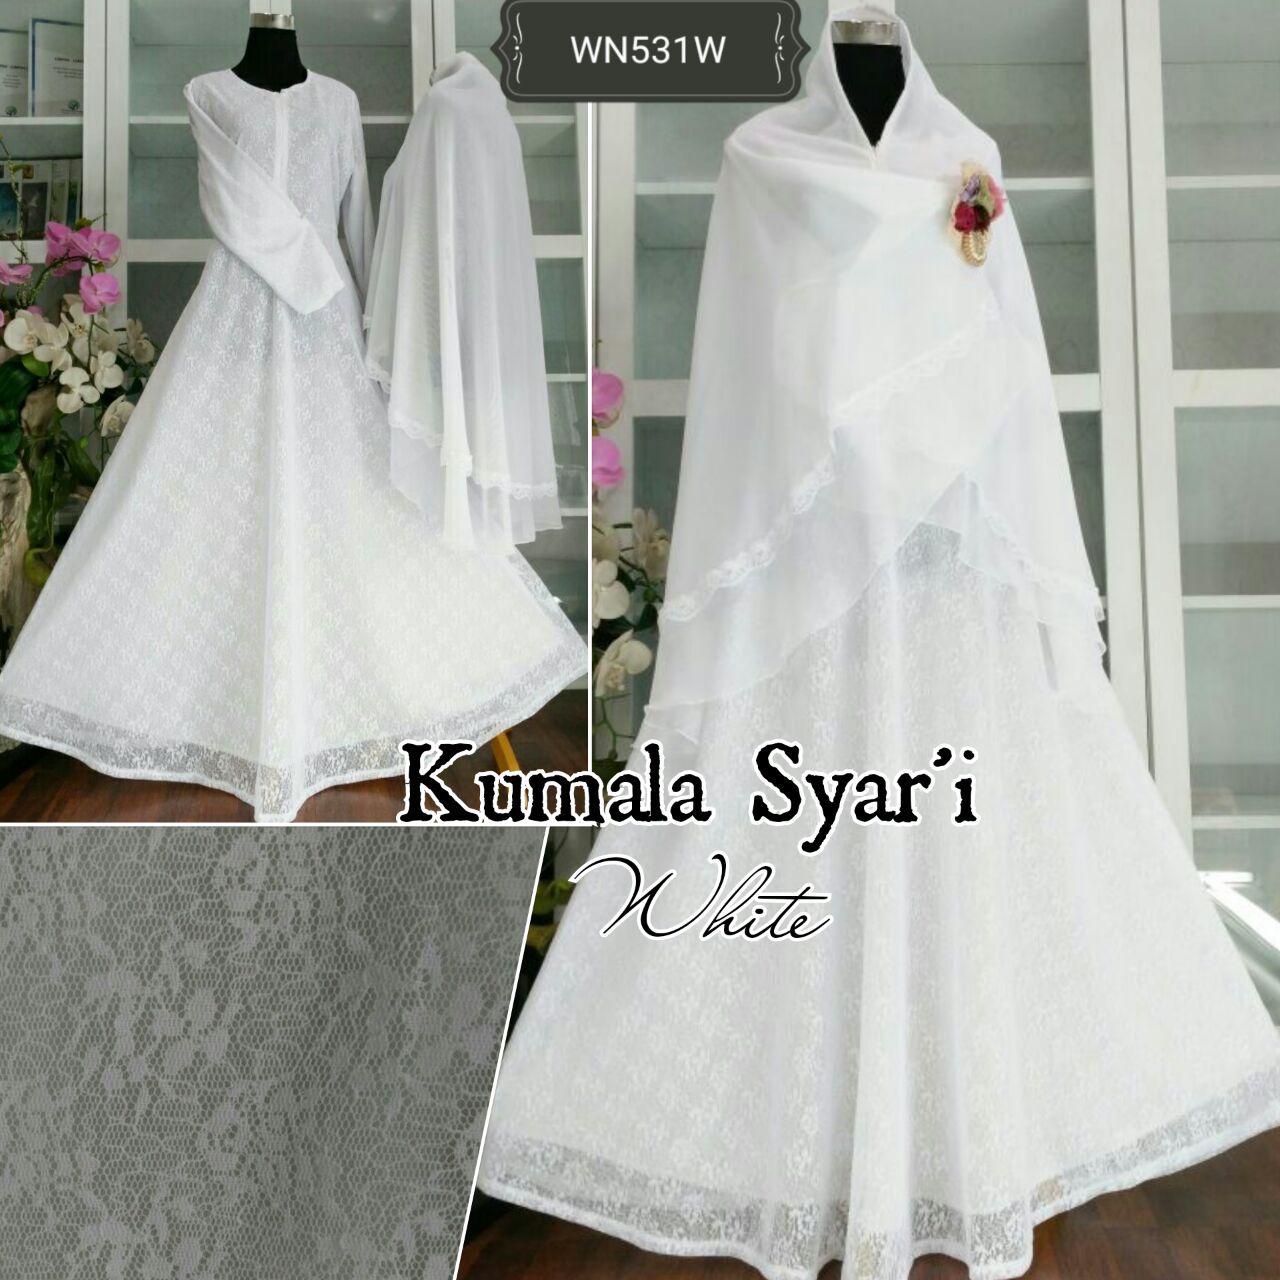 Jual Kumala Syari Bruklat Putih Gamis Putih Umroh Baju